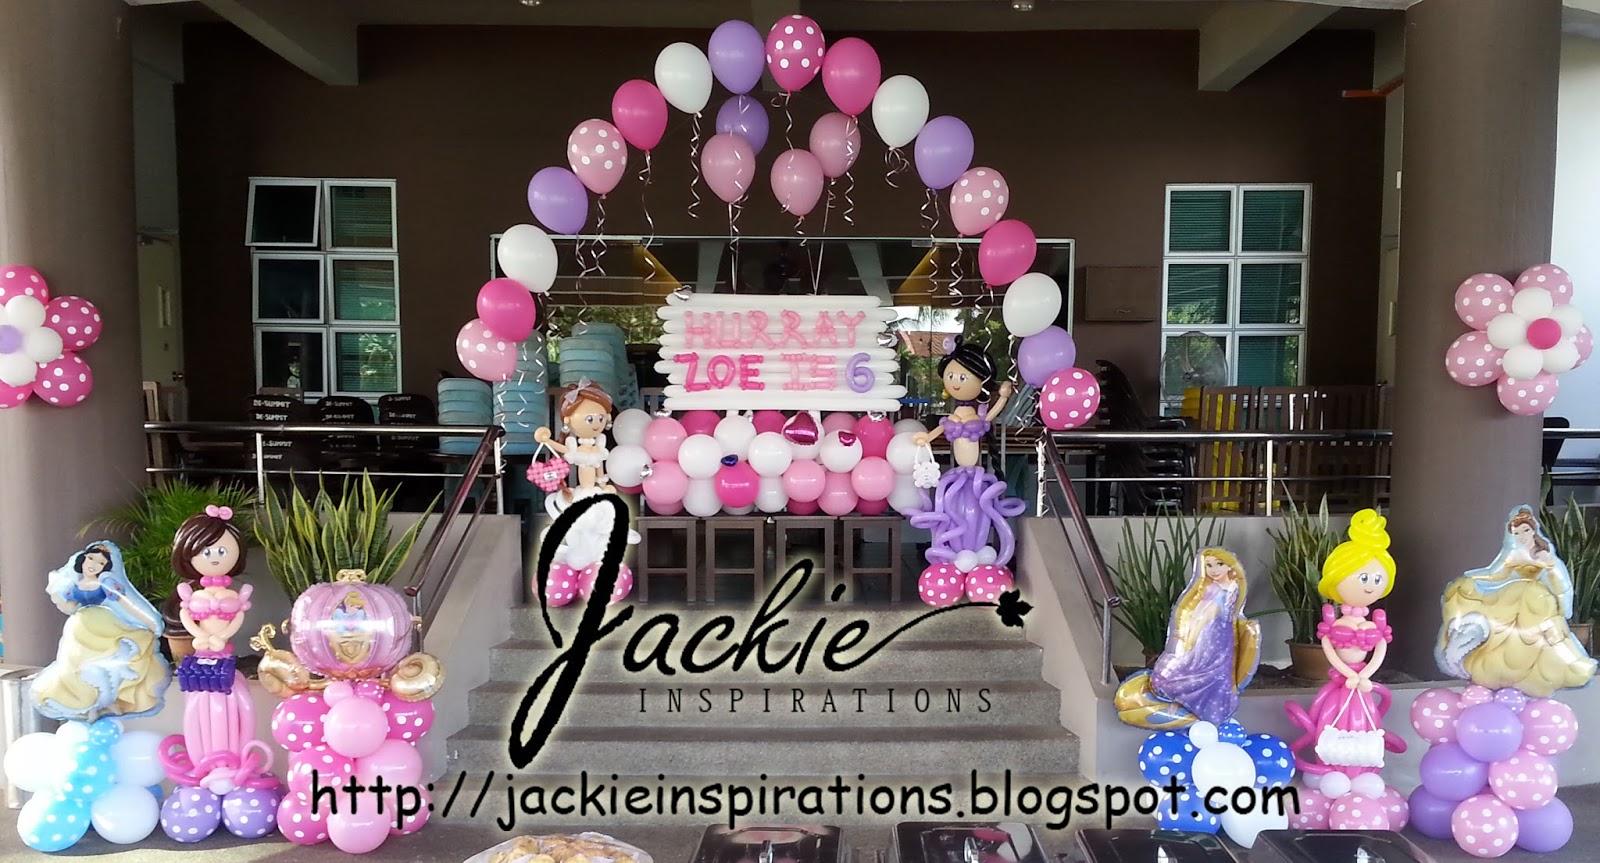 Princess Balloon Decoration Balloon Decorations For Weddings Birthday Parties Balloon